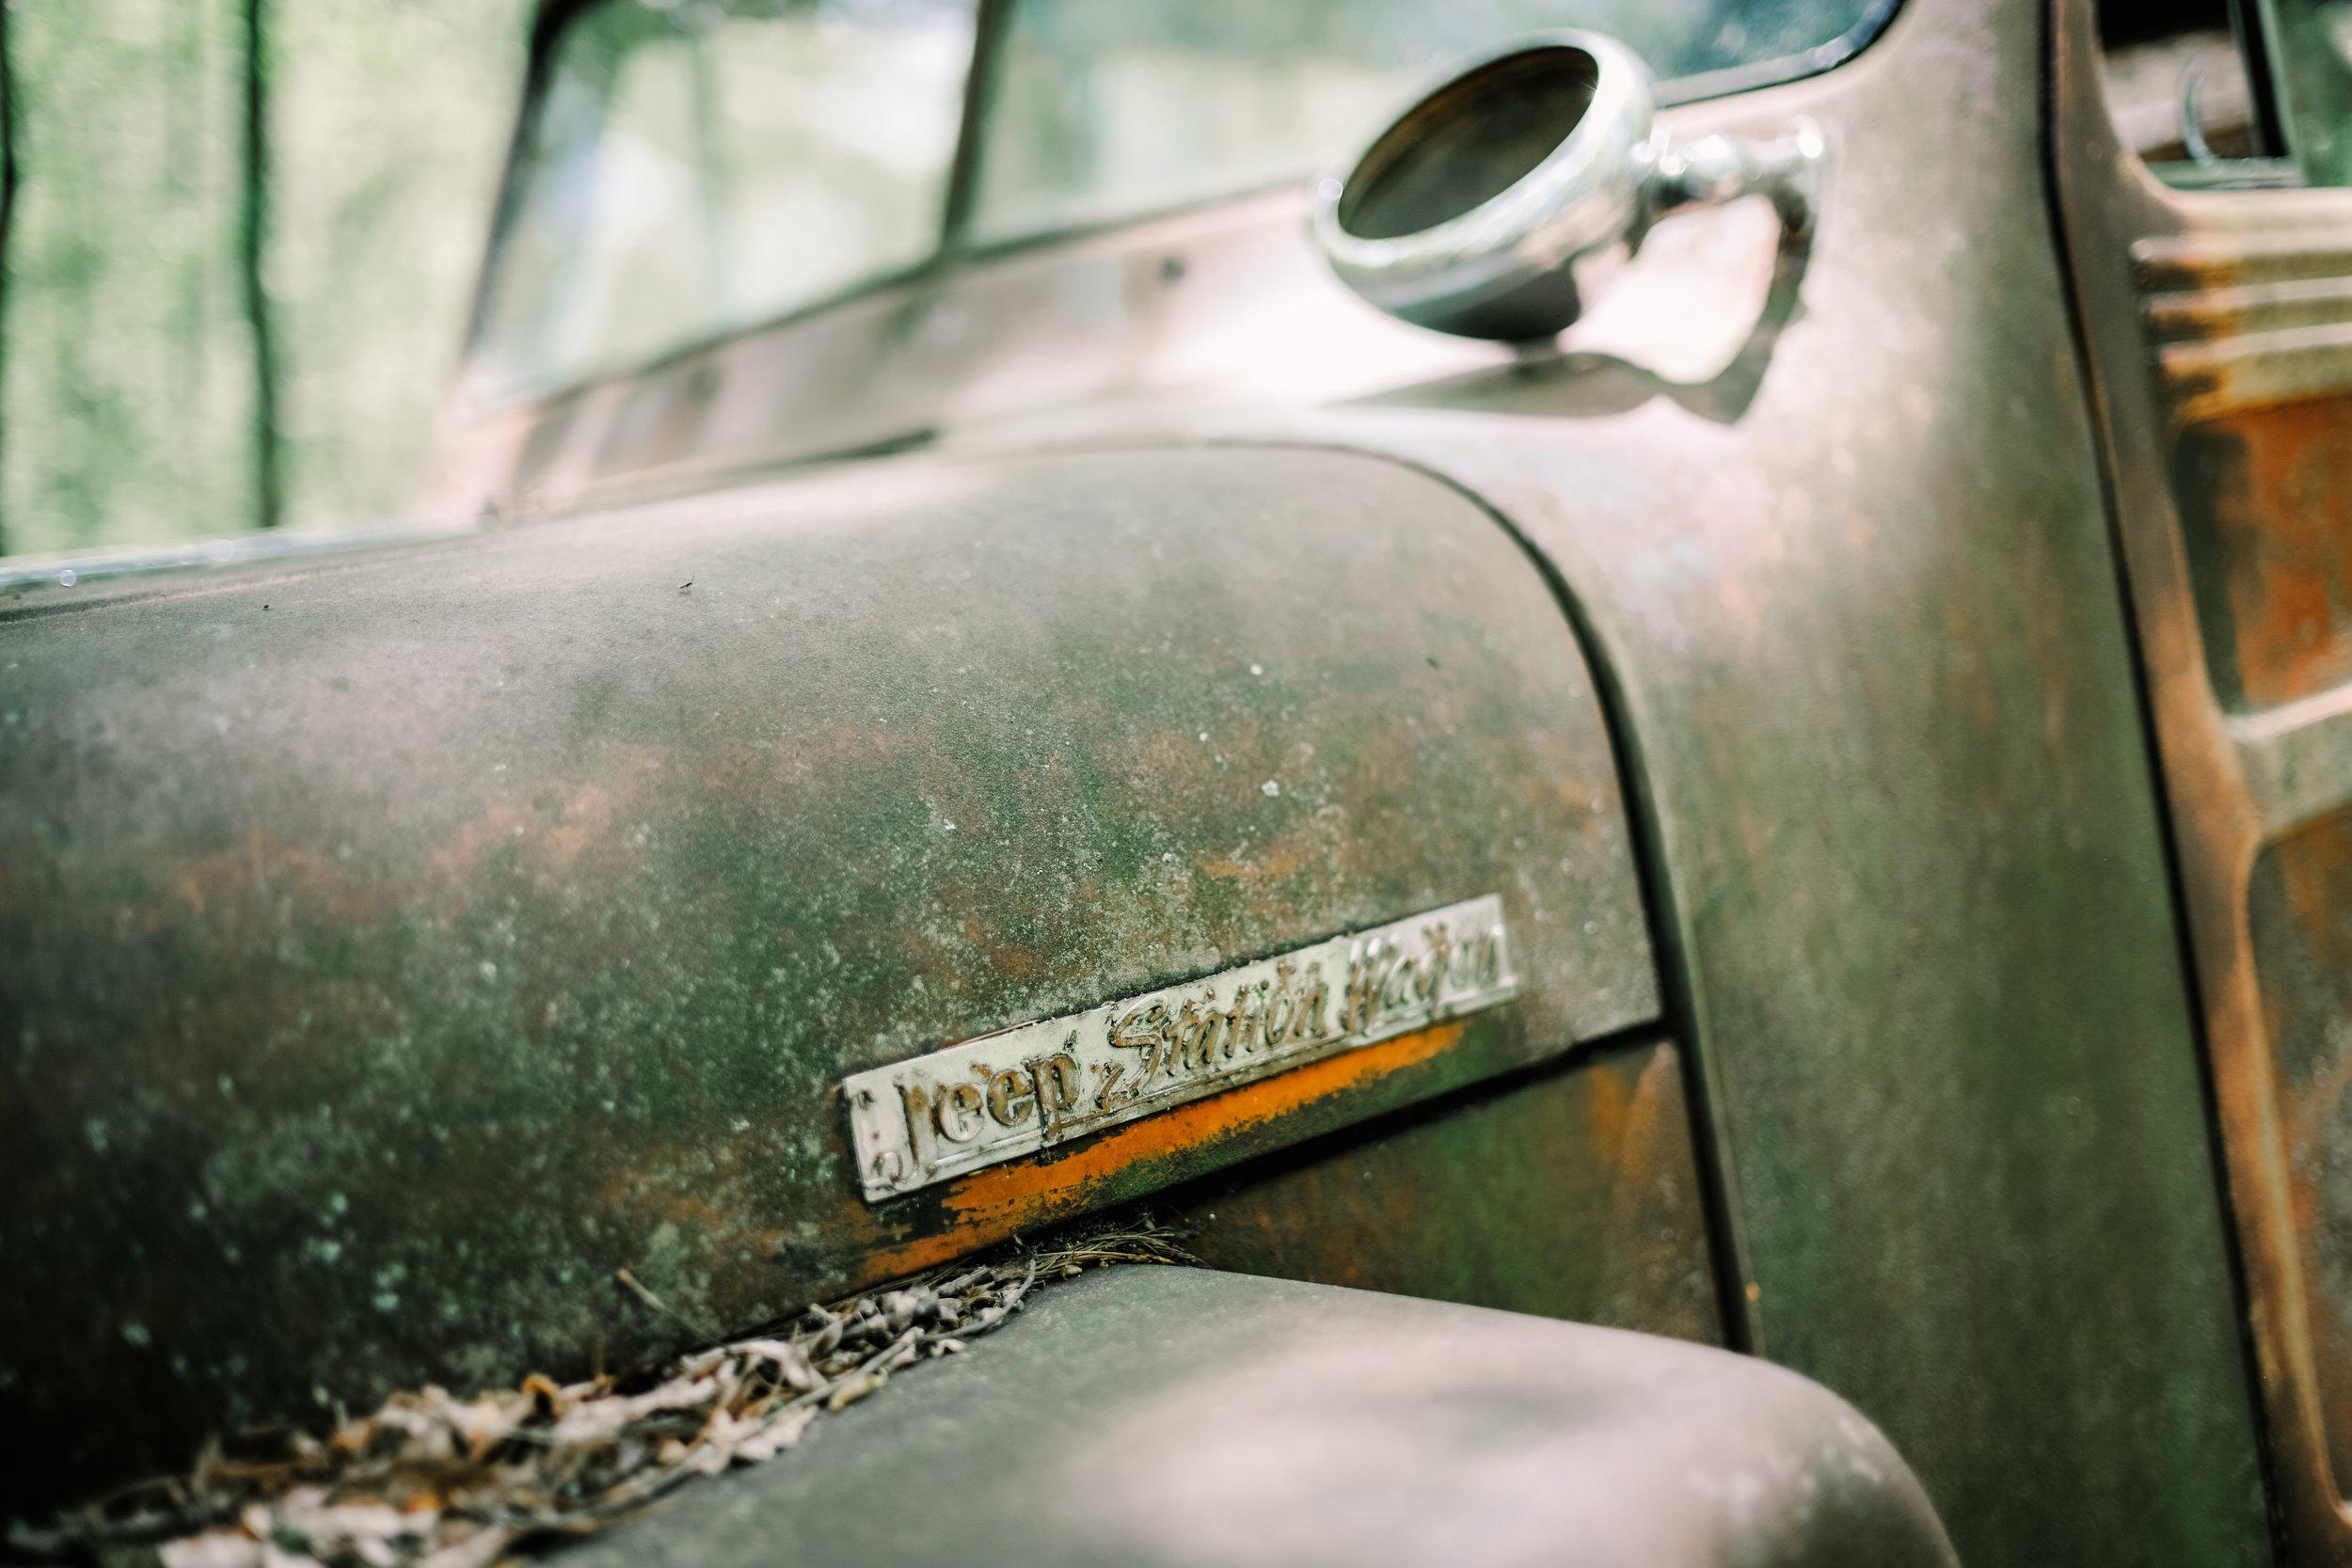 jeep-close-up.jpg